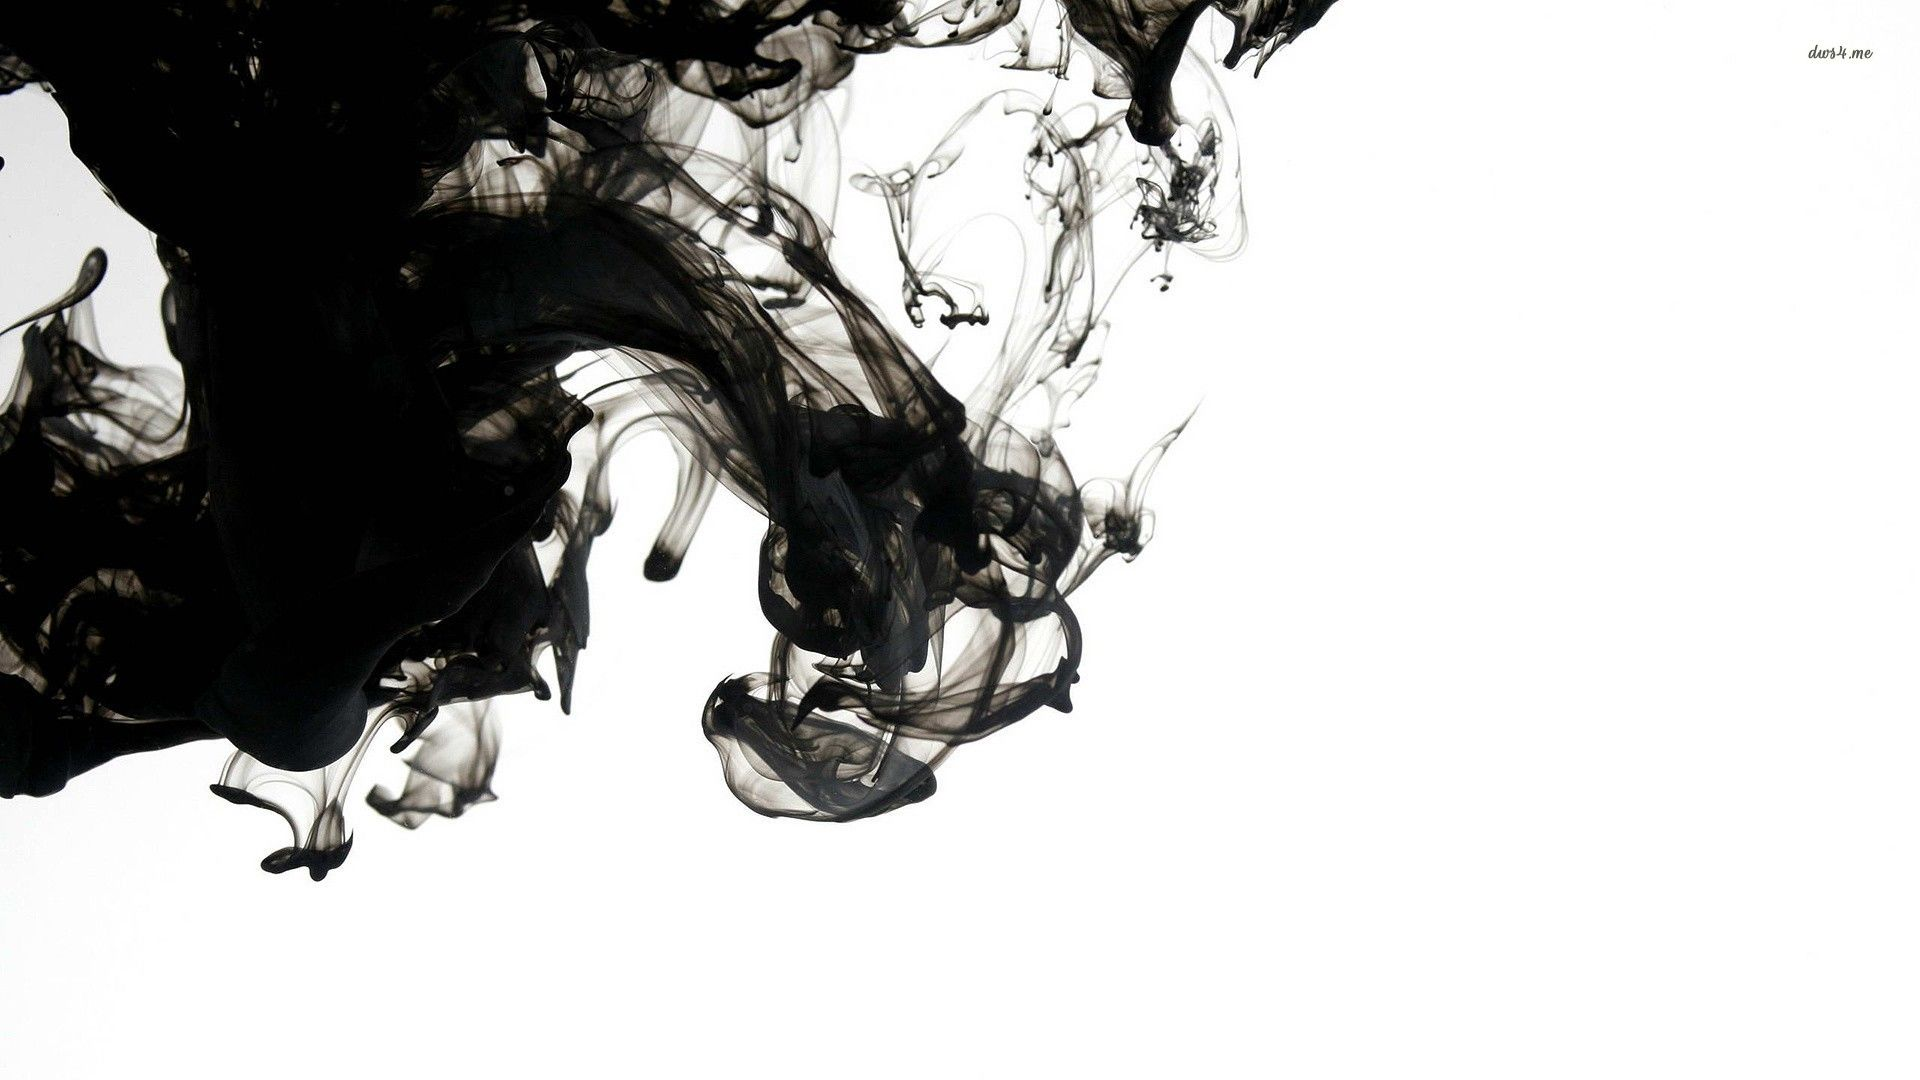 black smoke | gold and black smoke wallpaper 23 desktop background